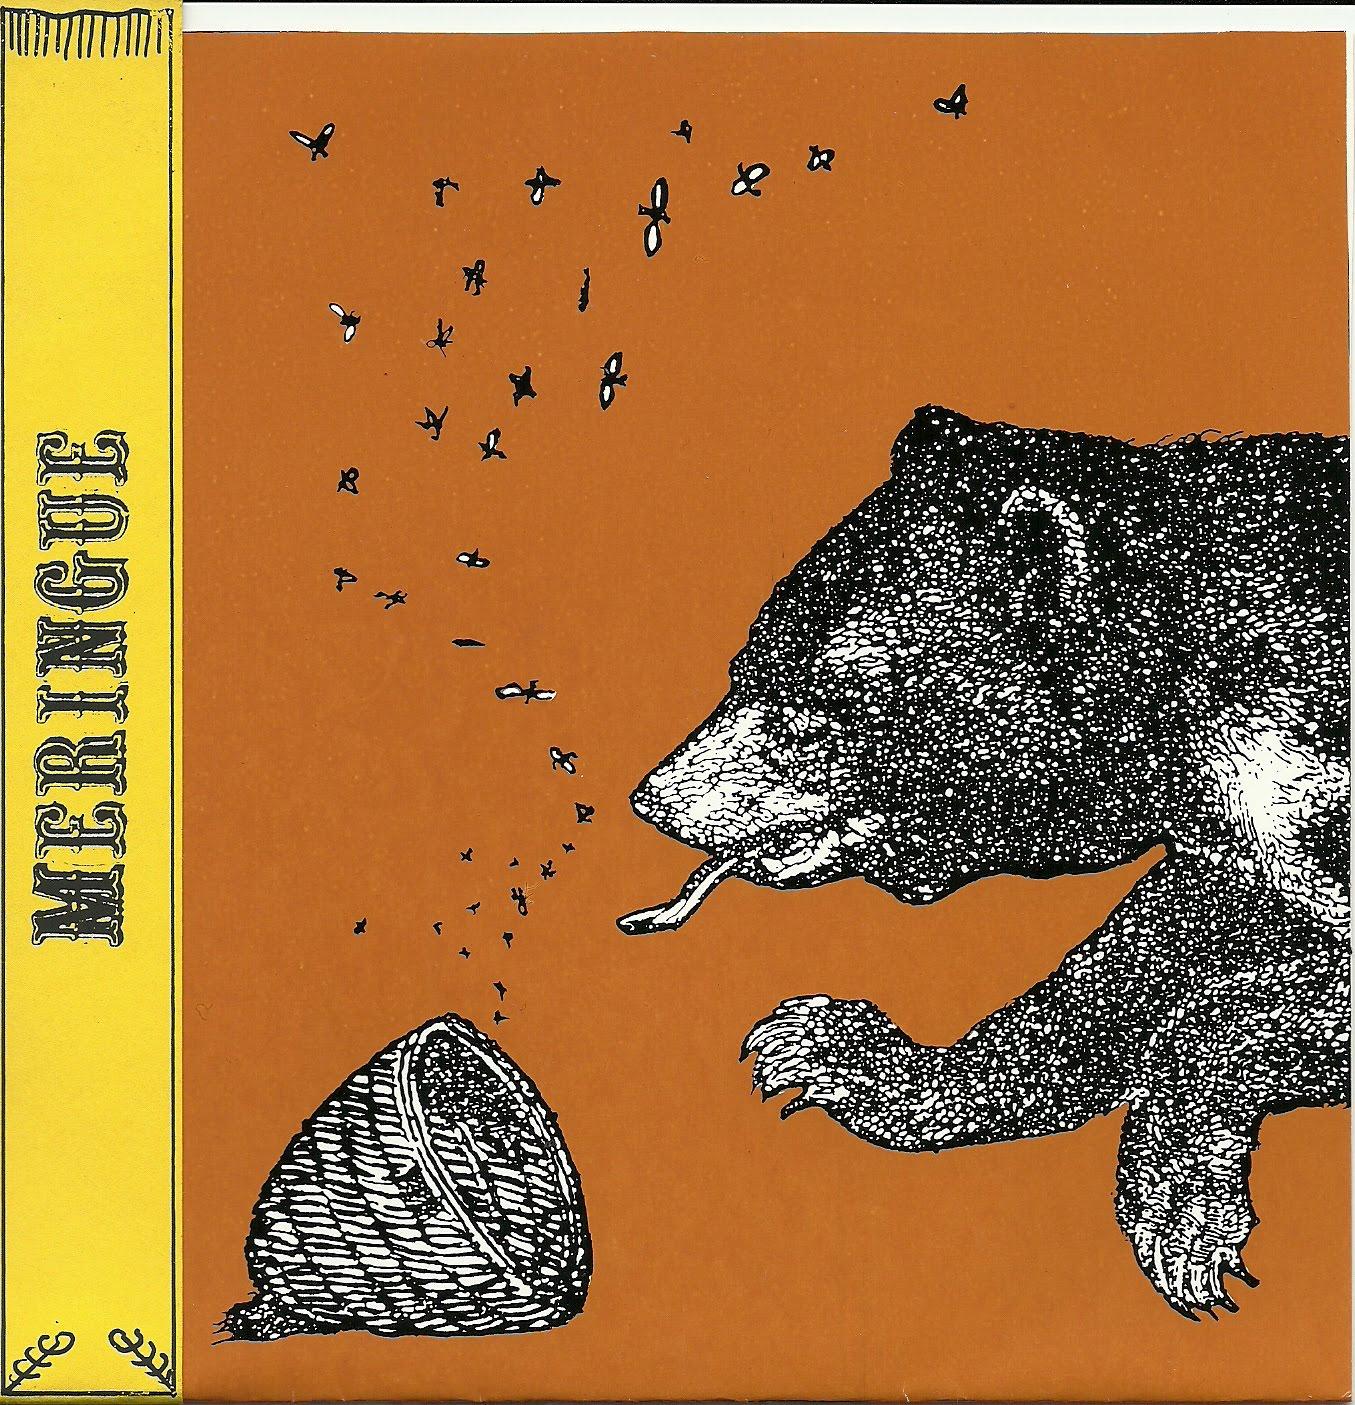 Grain - Roadkill / Edie